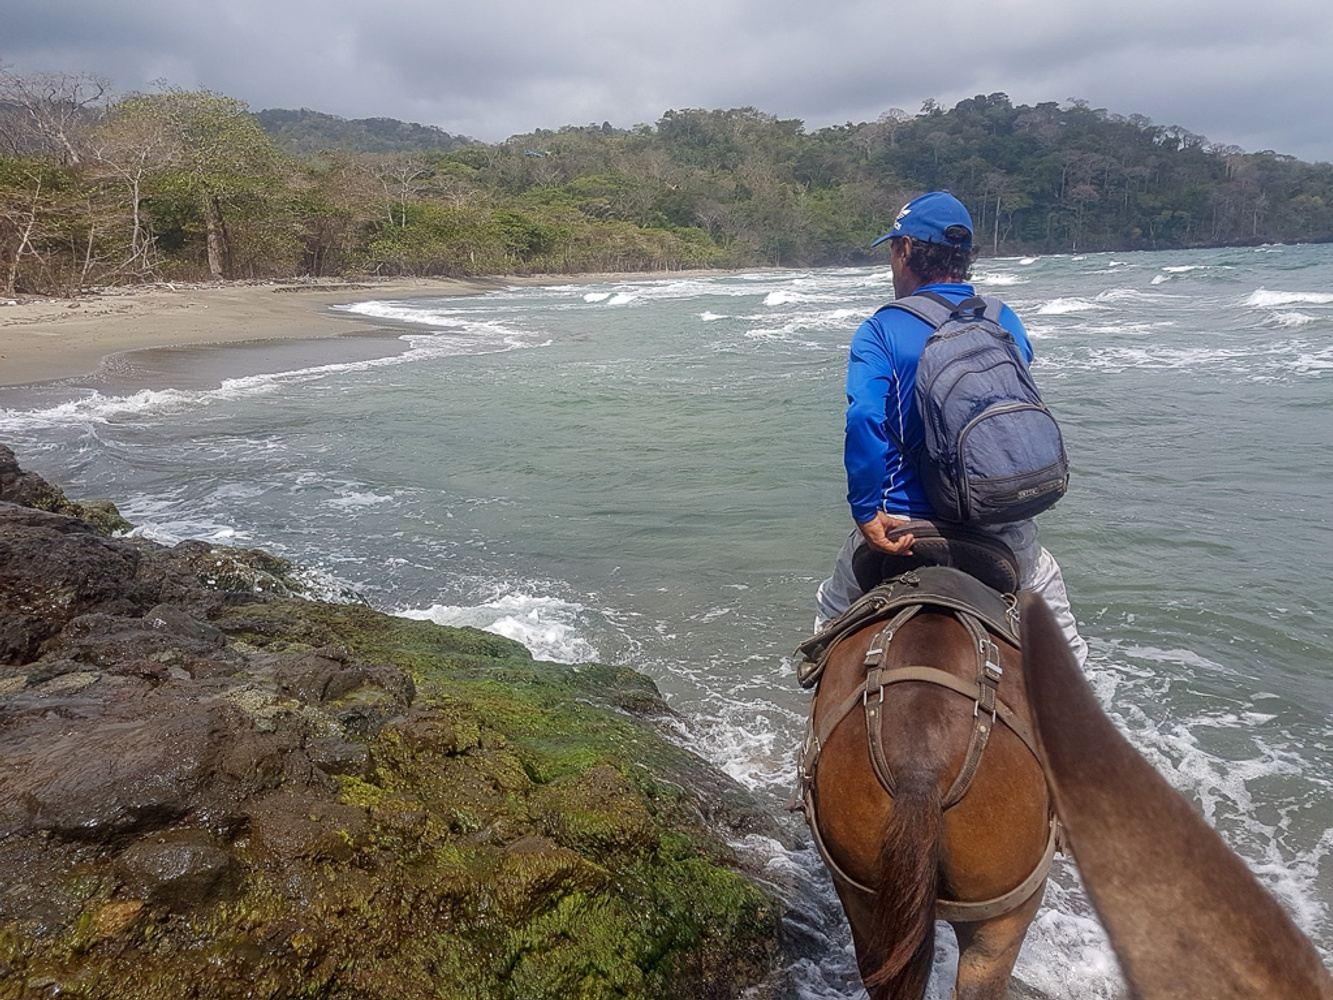 Titumate to Capurgana Horse riding